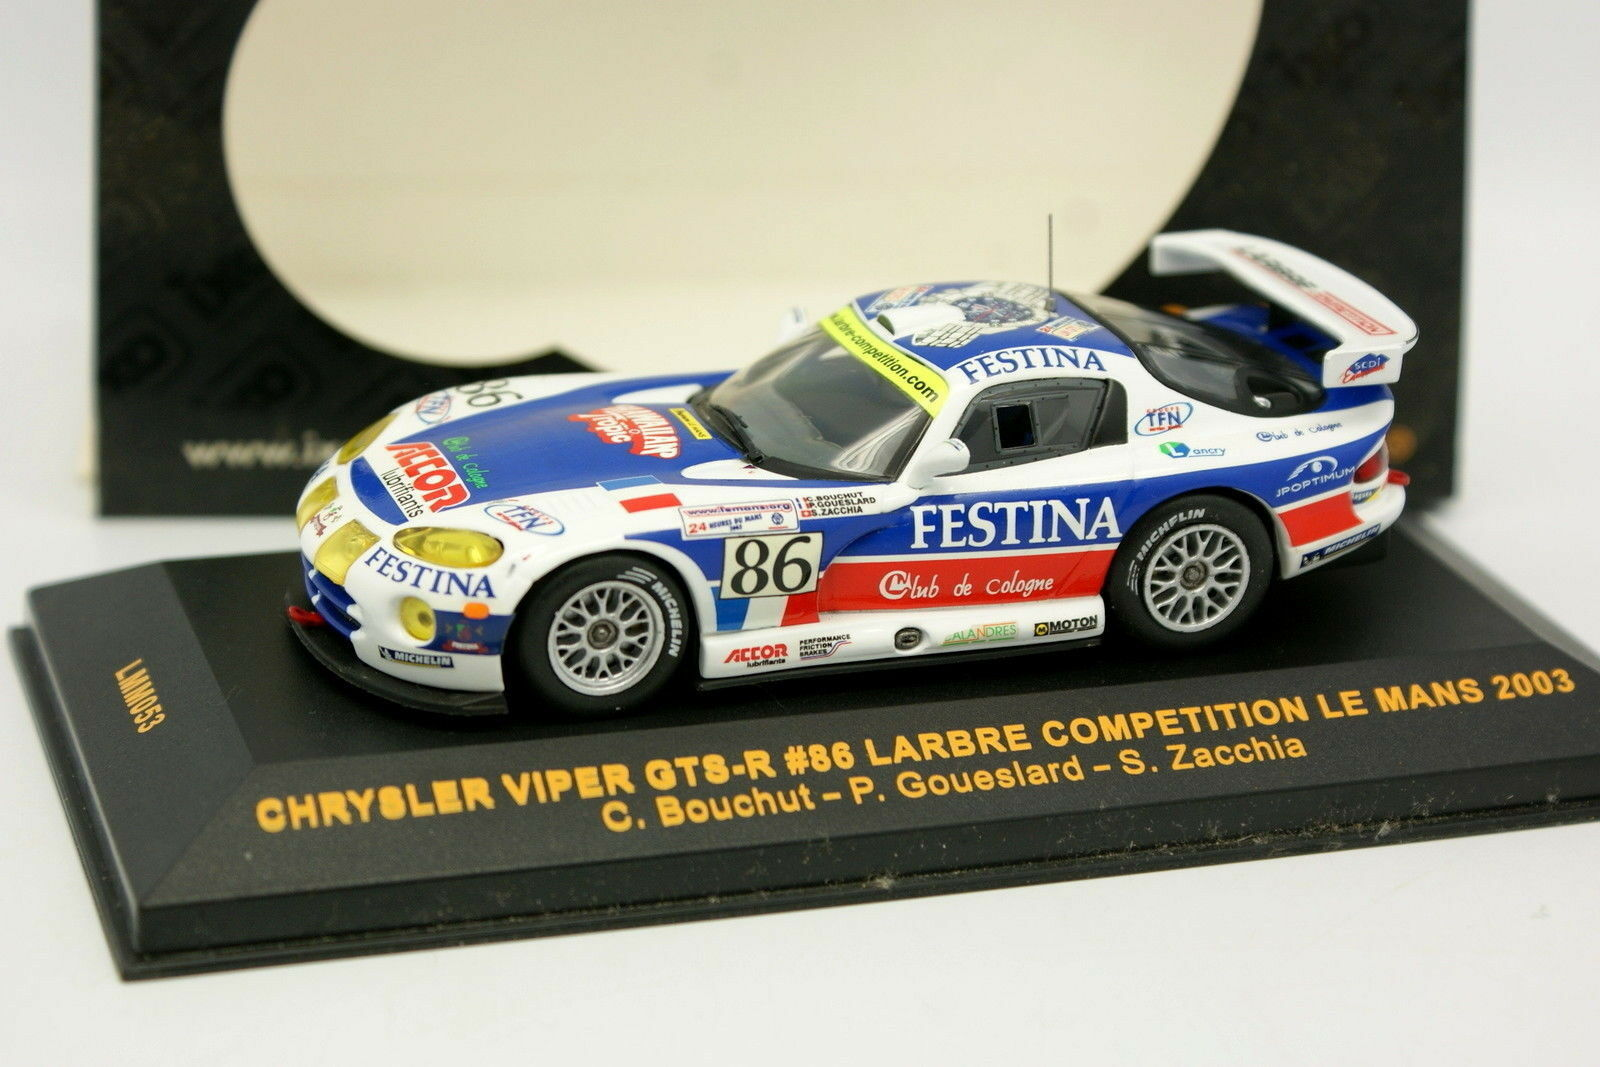 Ixo 1 43 - Chrysler Viper GTS R N.86 Larbre Le Mans 2003